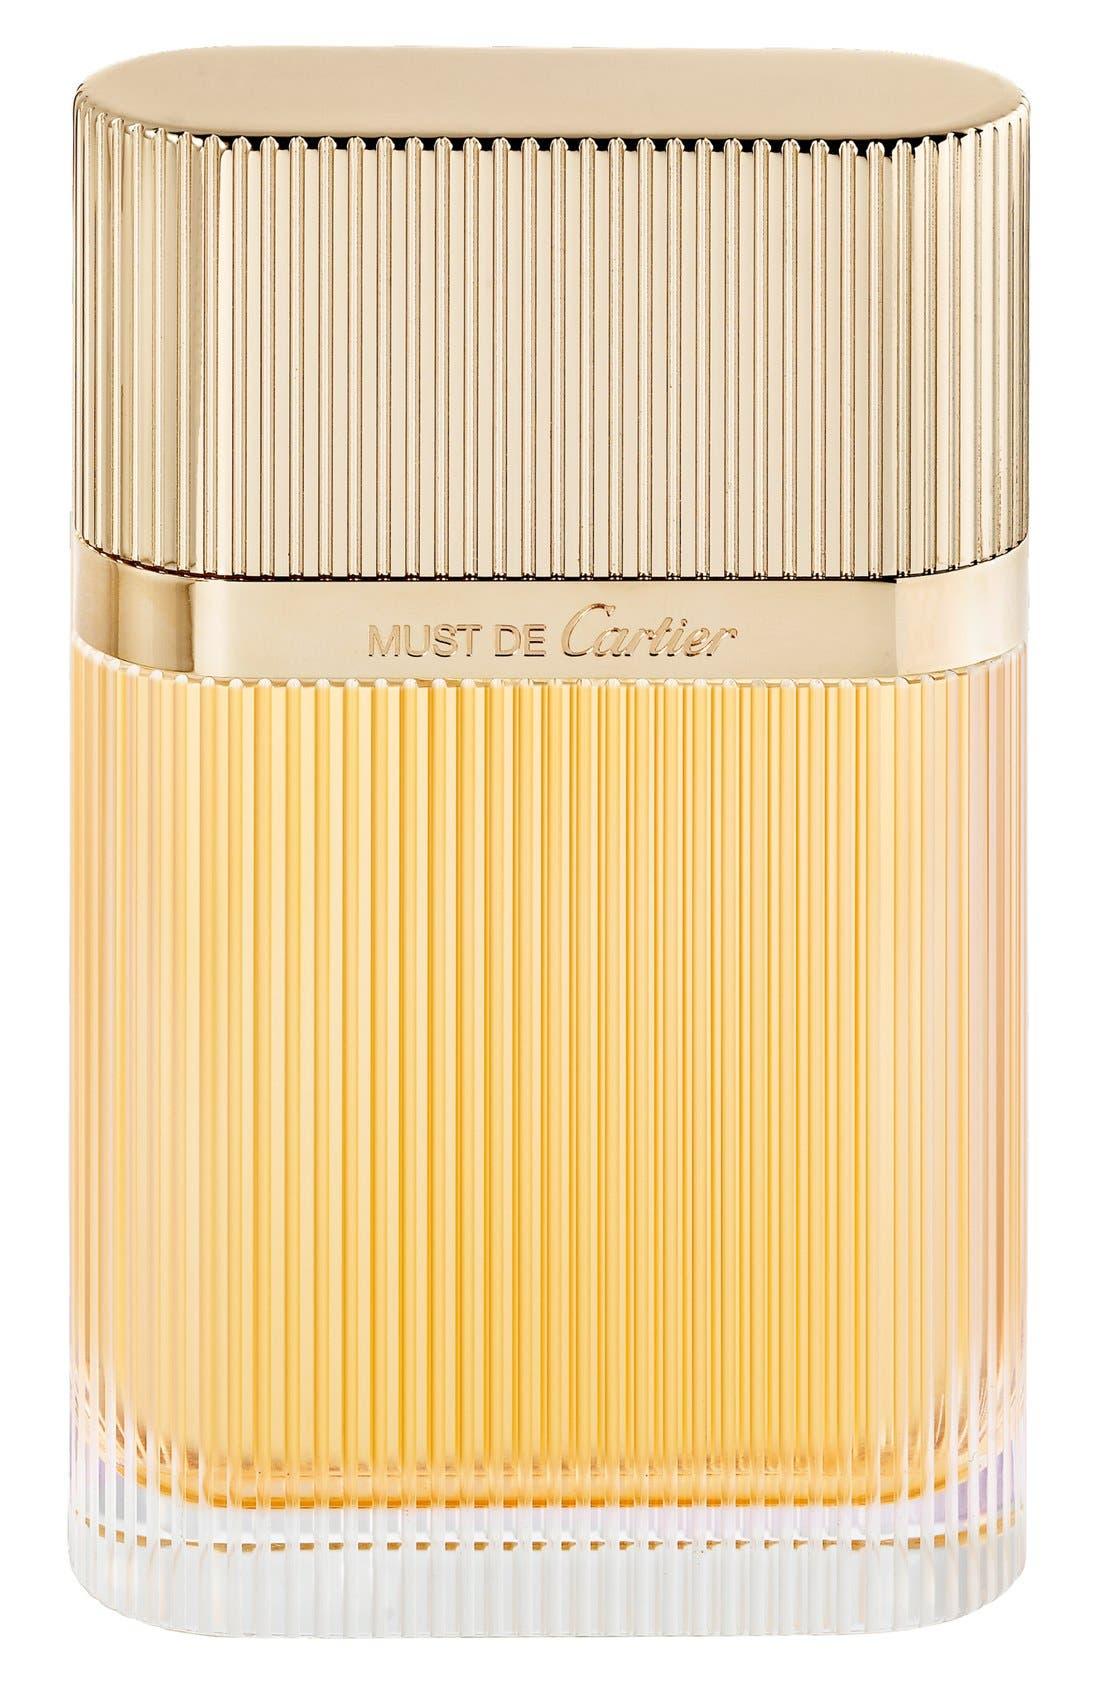 Cartier 'Must de Cartier Gold' Eau de Parfum